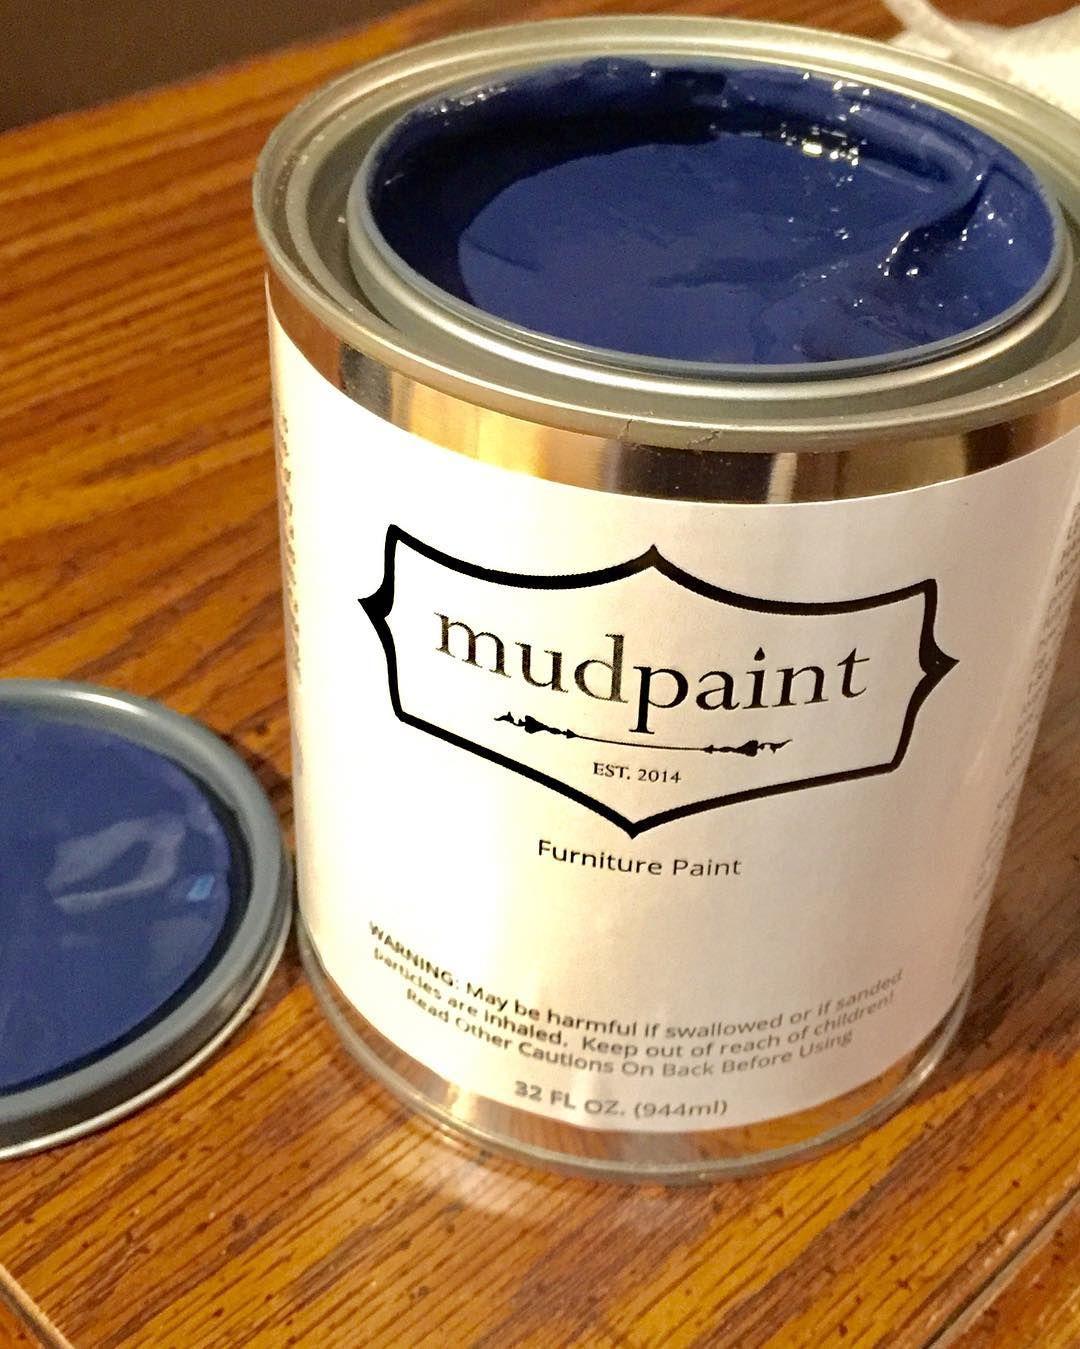 MudPaint has a new color! A beautiful blue called Catalina. Love the dark blue. You can buy it @rustandrosesabilenetx in Abilene @mwmerchant !! #mudpaintretailer #blueforyou #lovetheblues #ivegottheblues #catalina #mudpaint #mudpaintvintagefurniturepaint